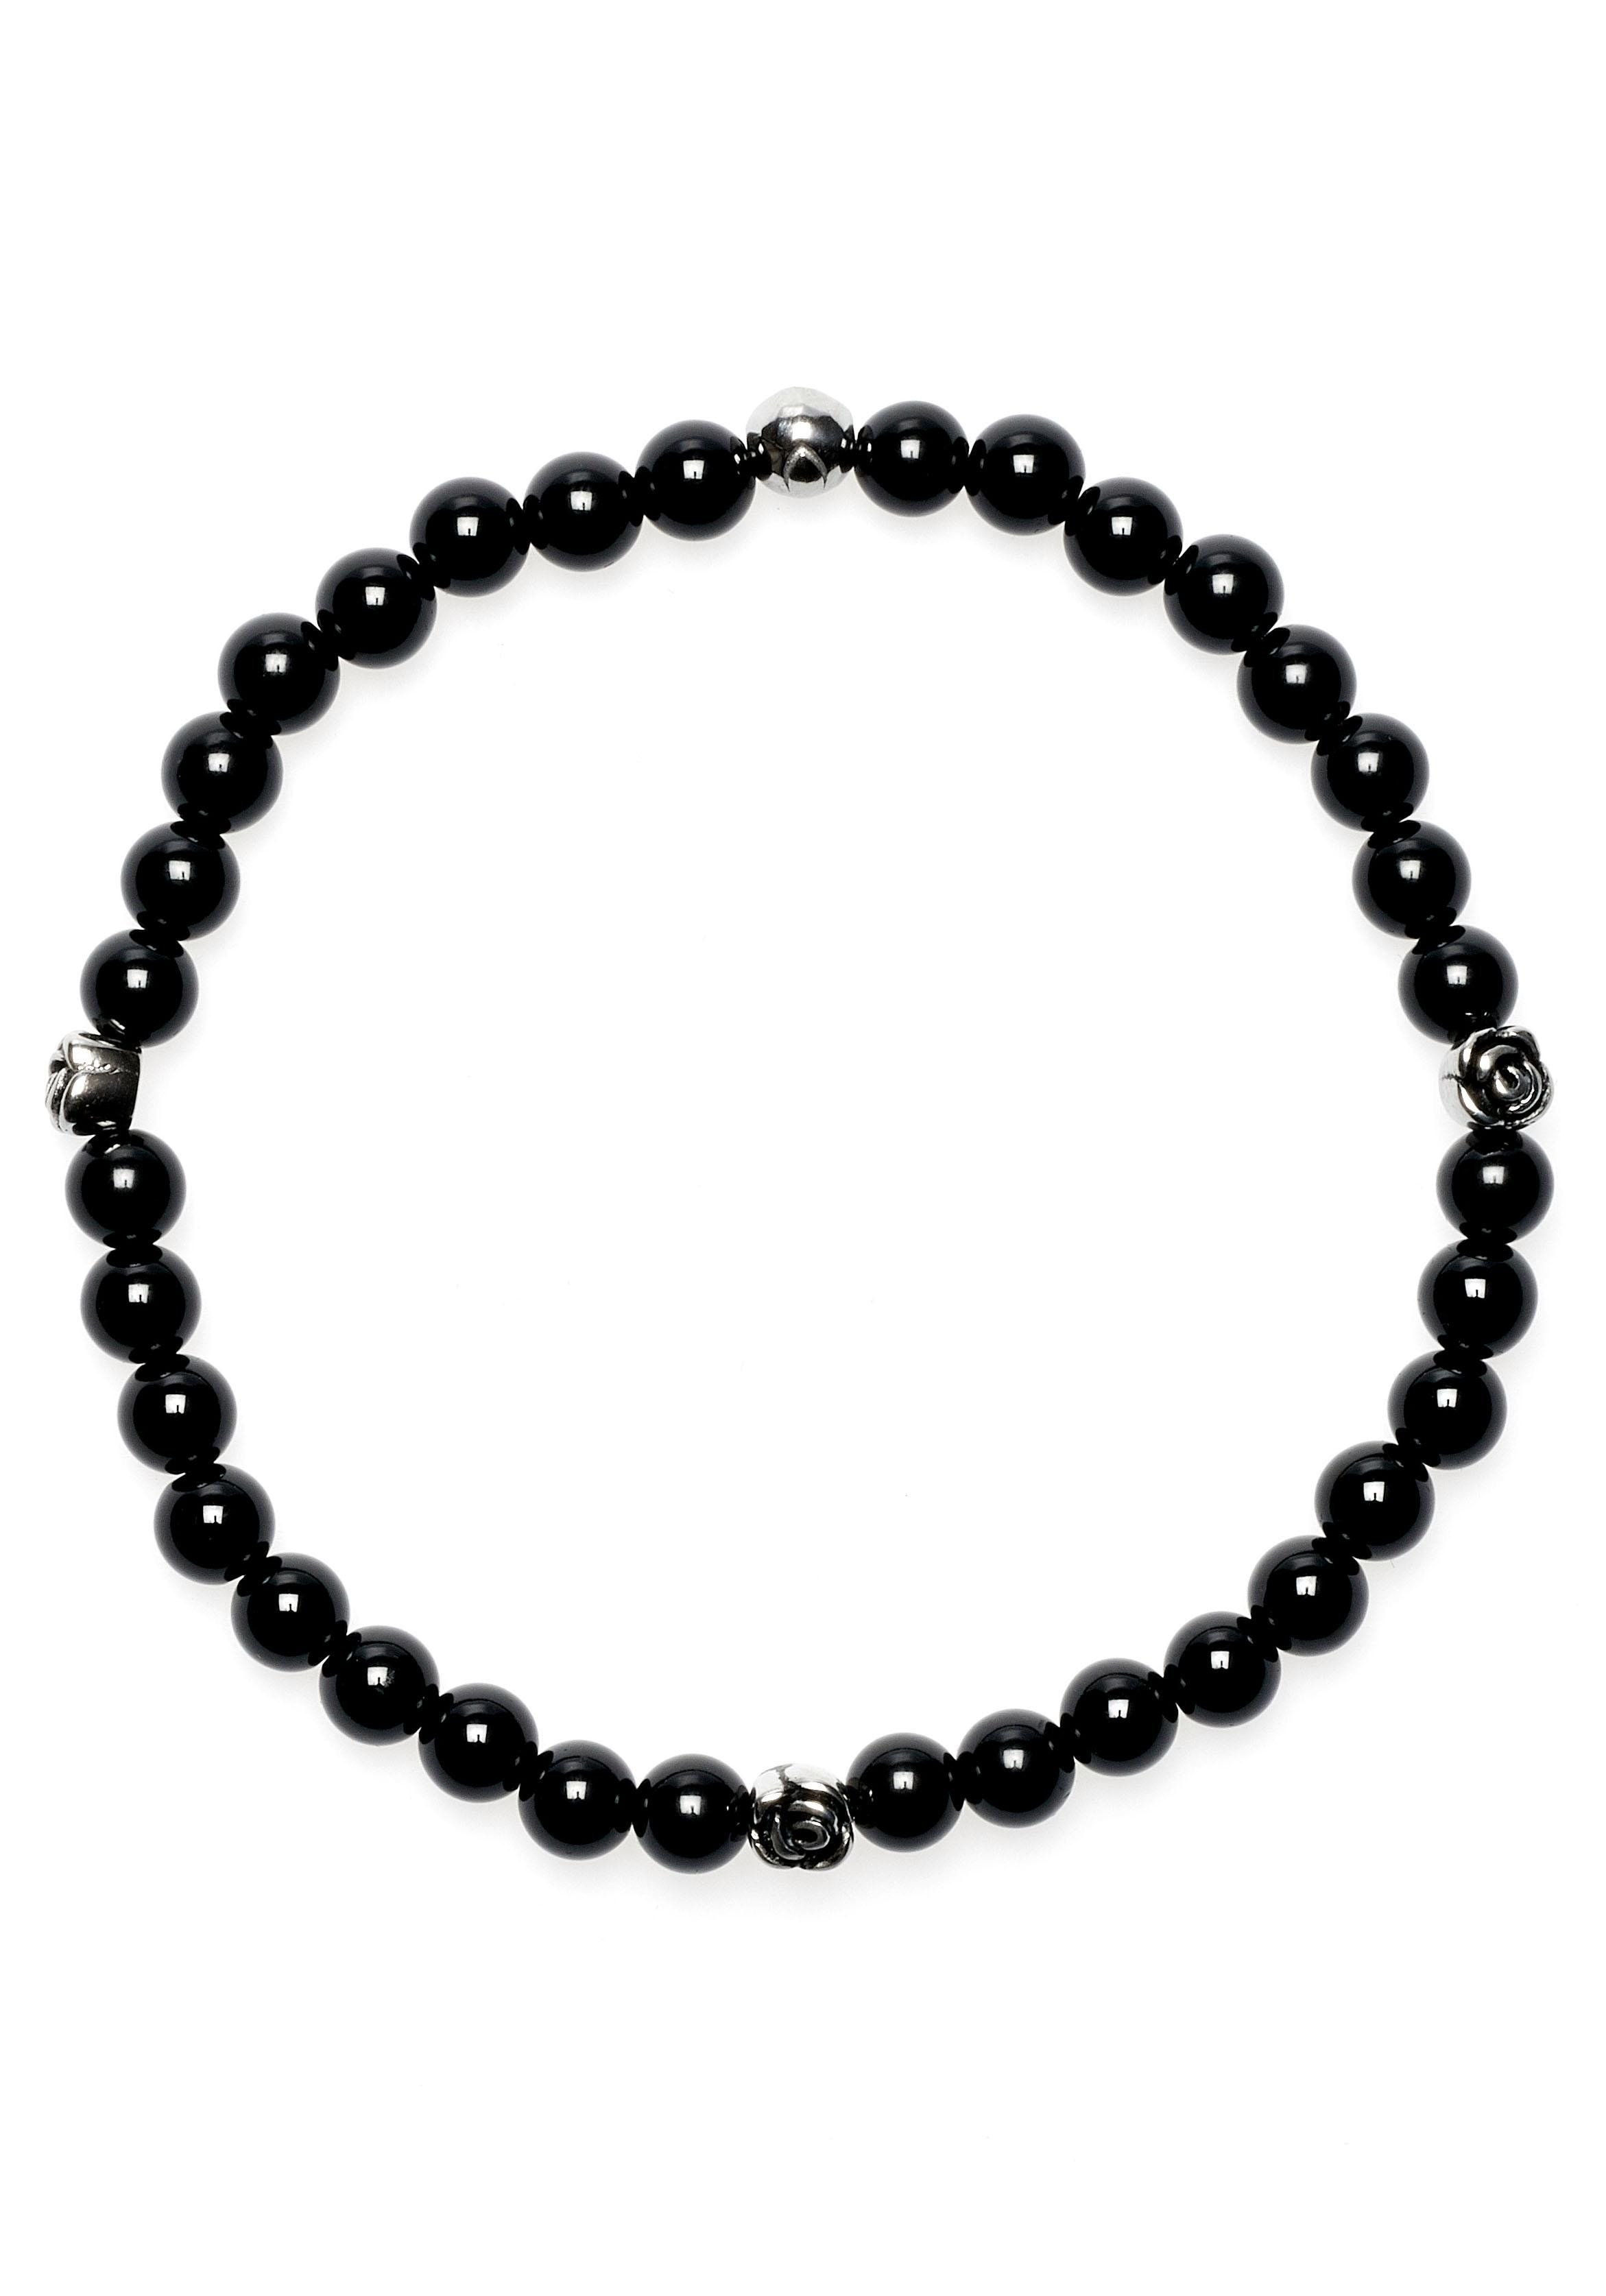 ROYAL EGO Armband Rose - Lava Bead Rose black silver 1709   Schmuck > Armbänder > Sonstige Armbänder   Schwarz   Royal Ego